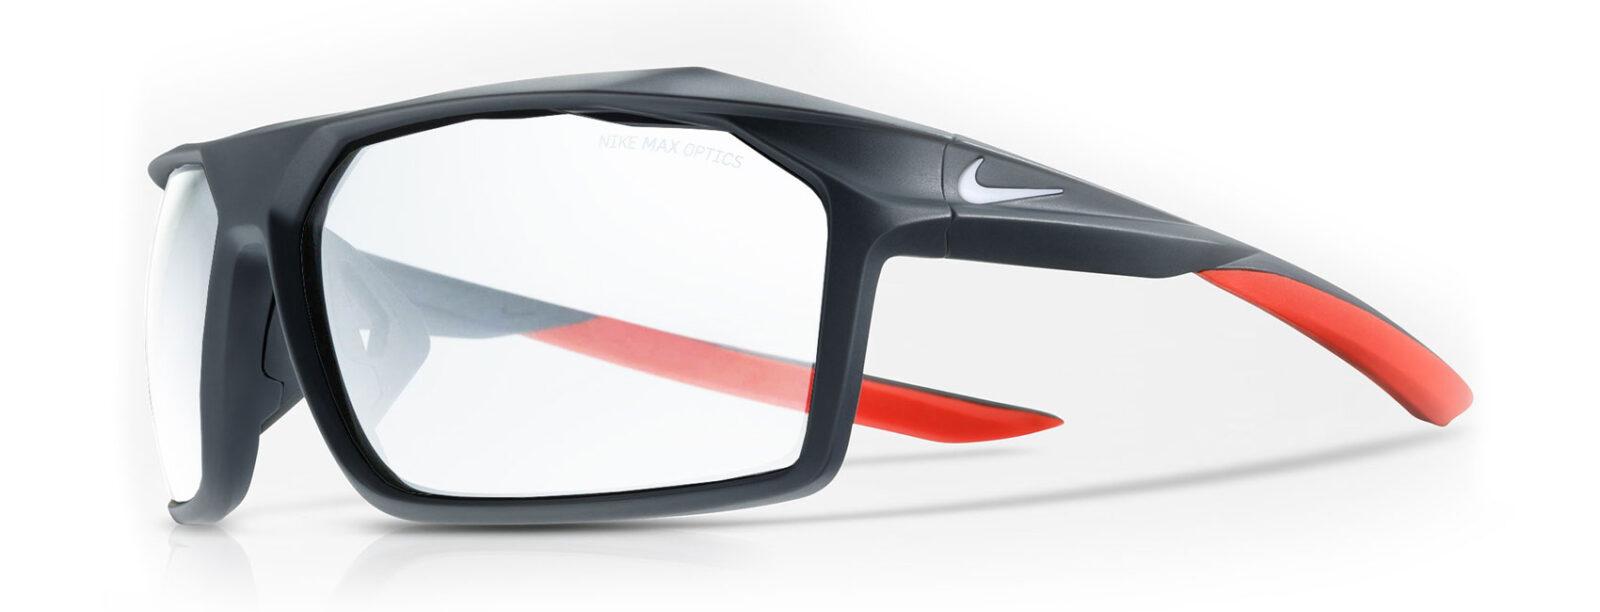 lead glasses nike traverse matte black